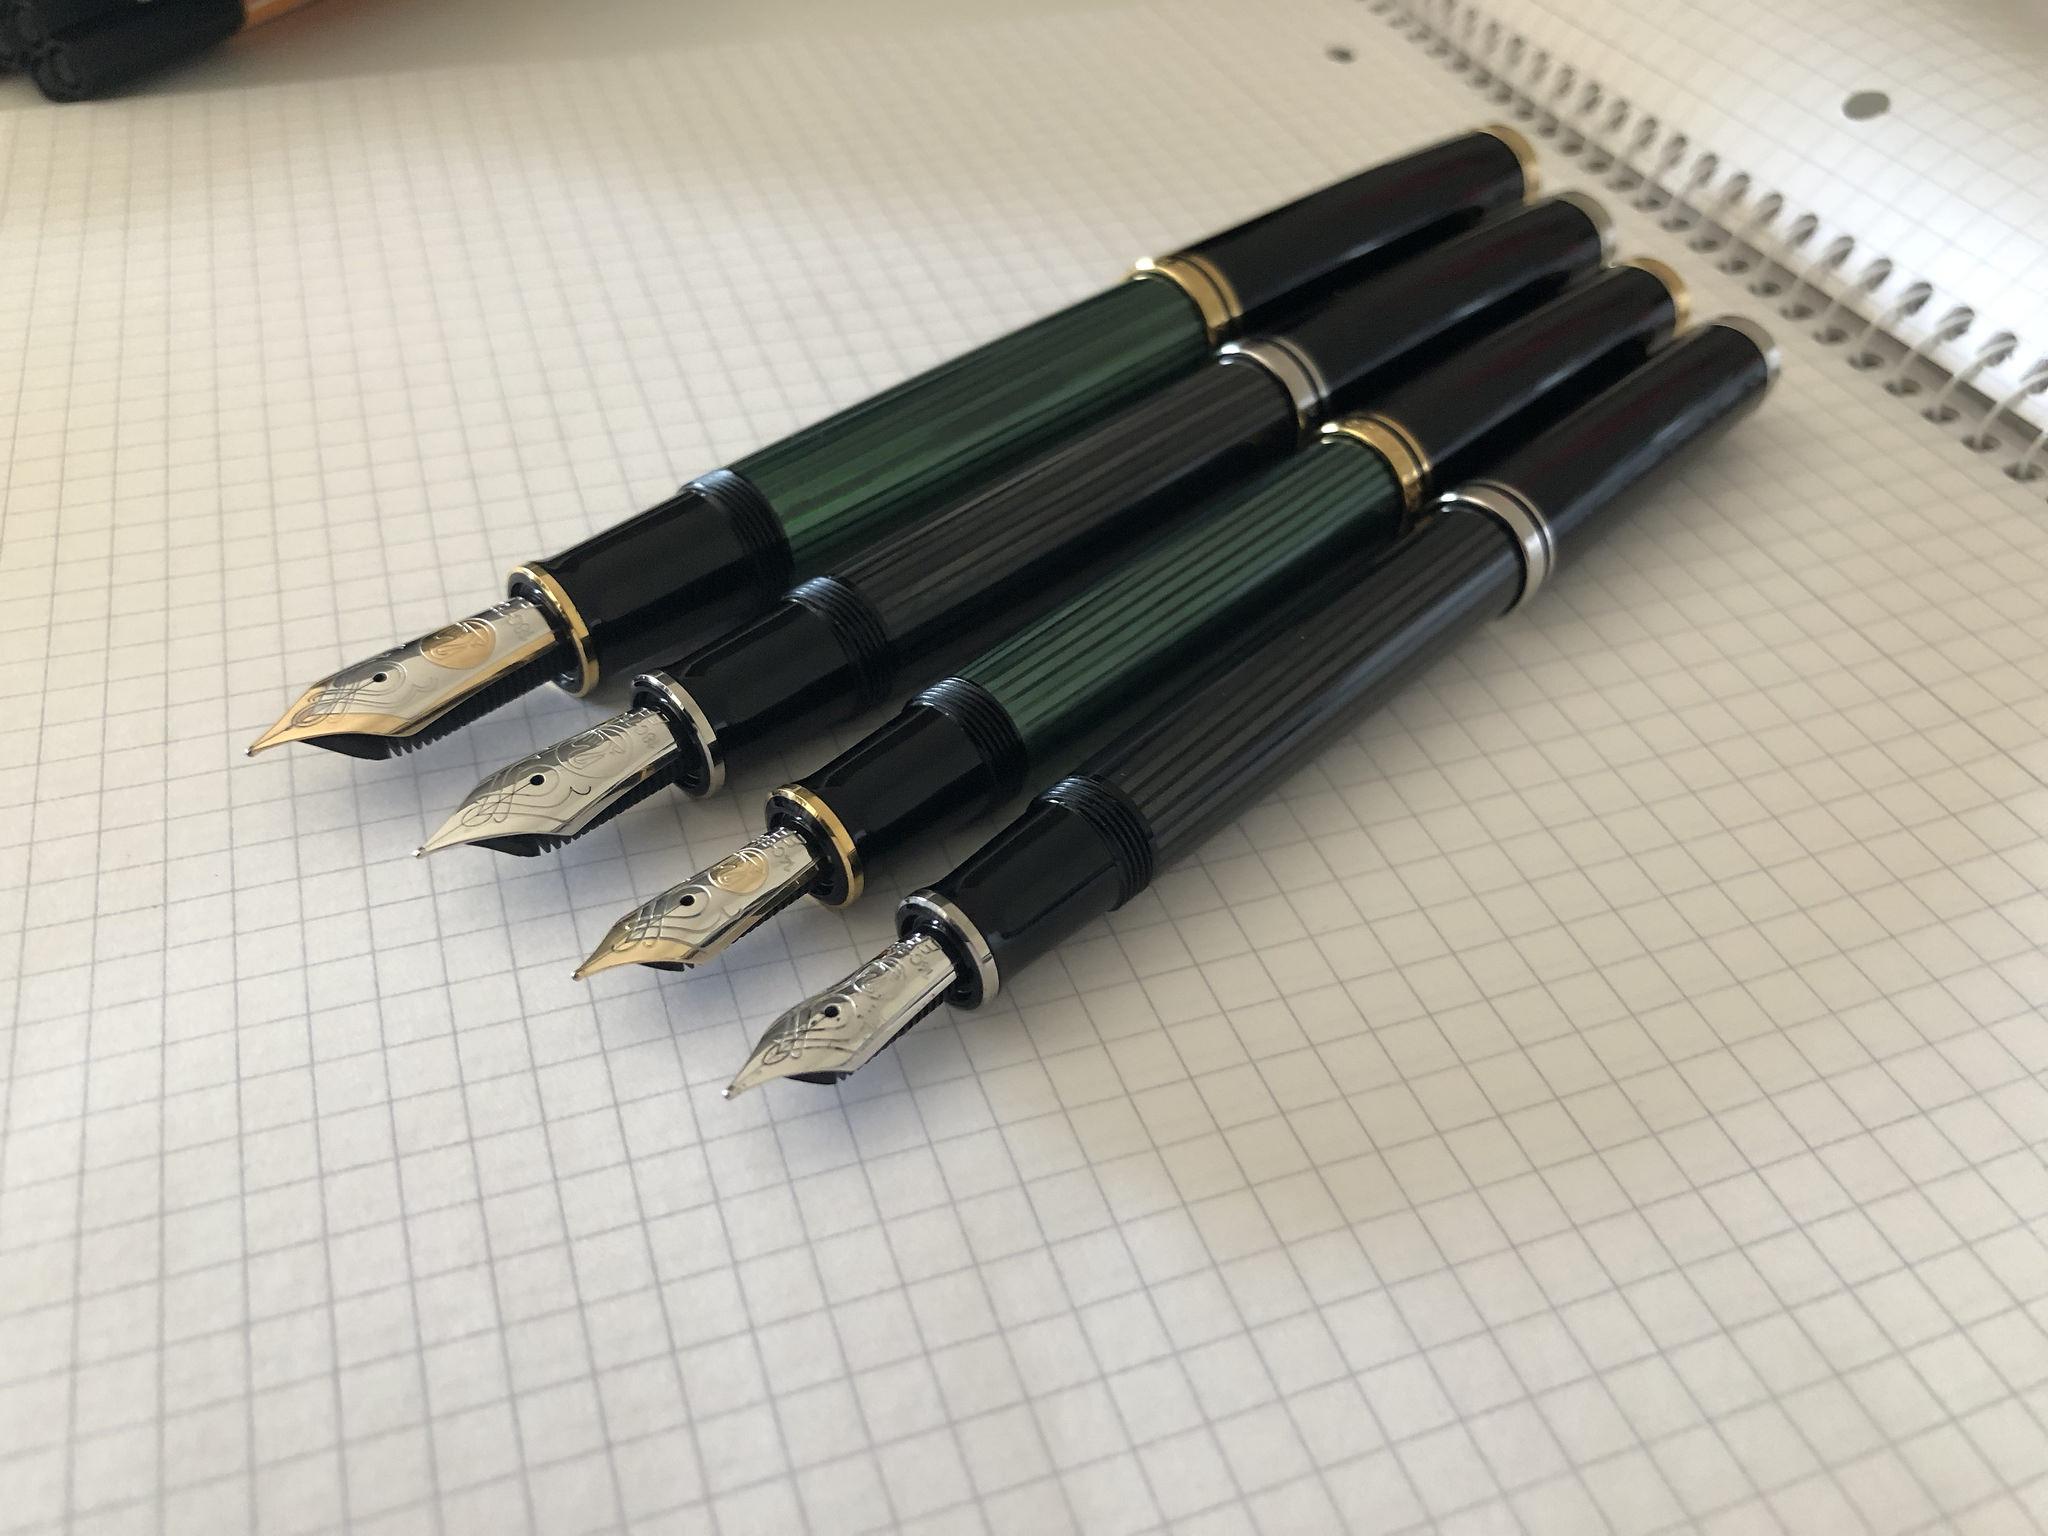 Pelikan Souverän Series